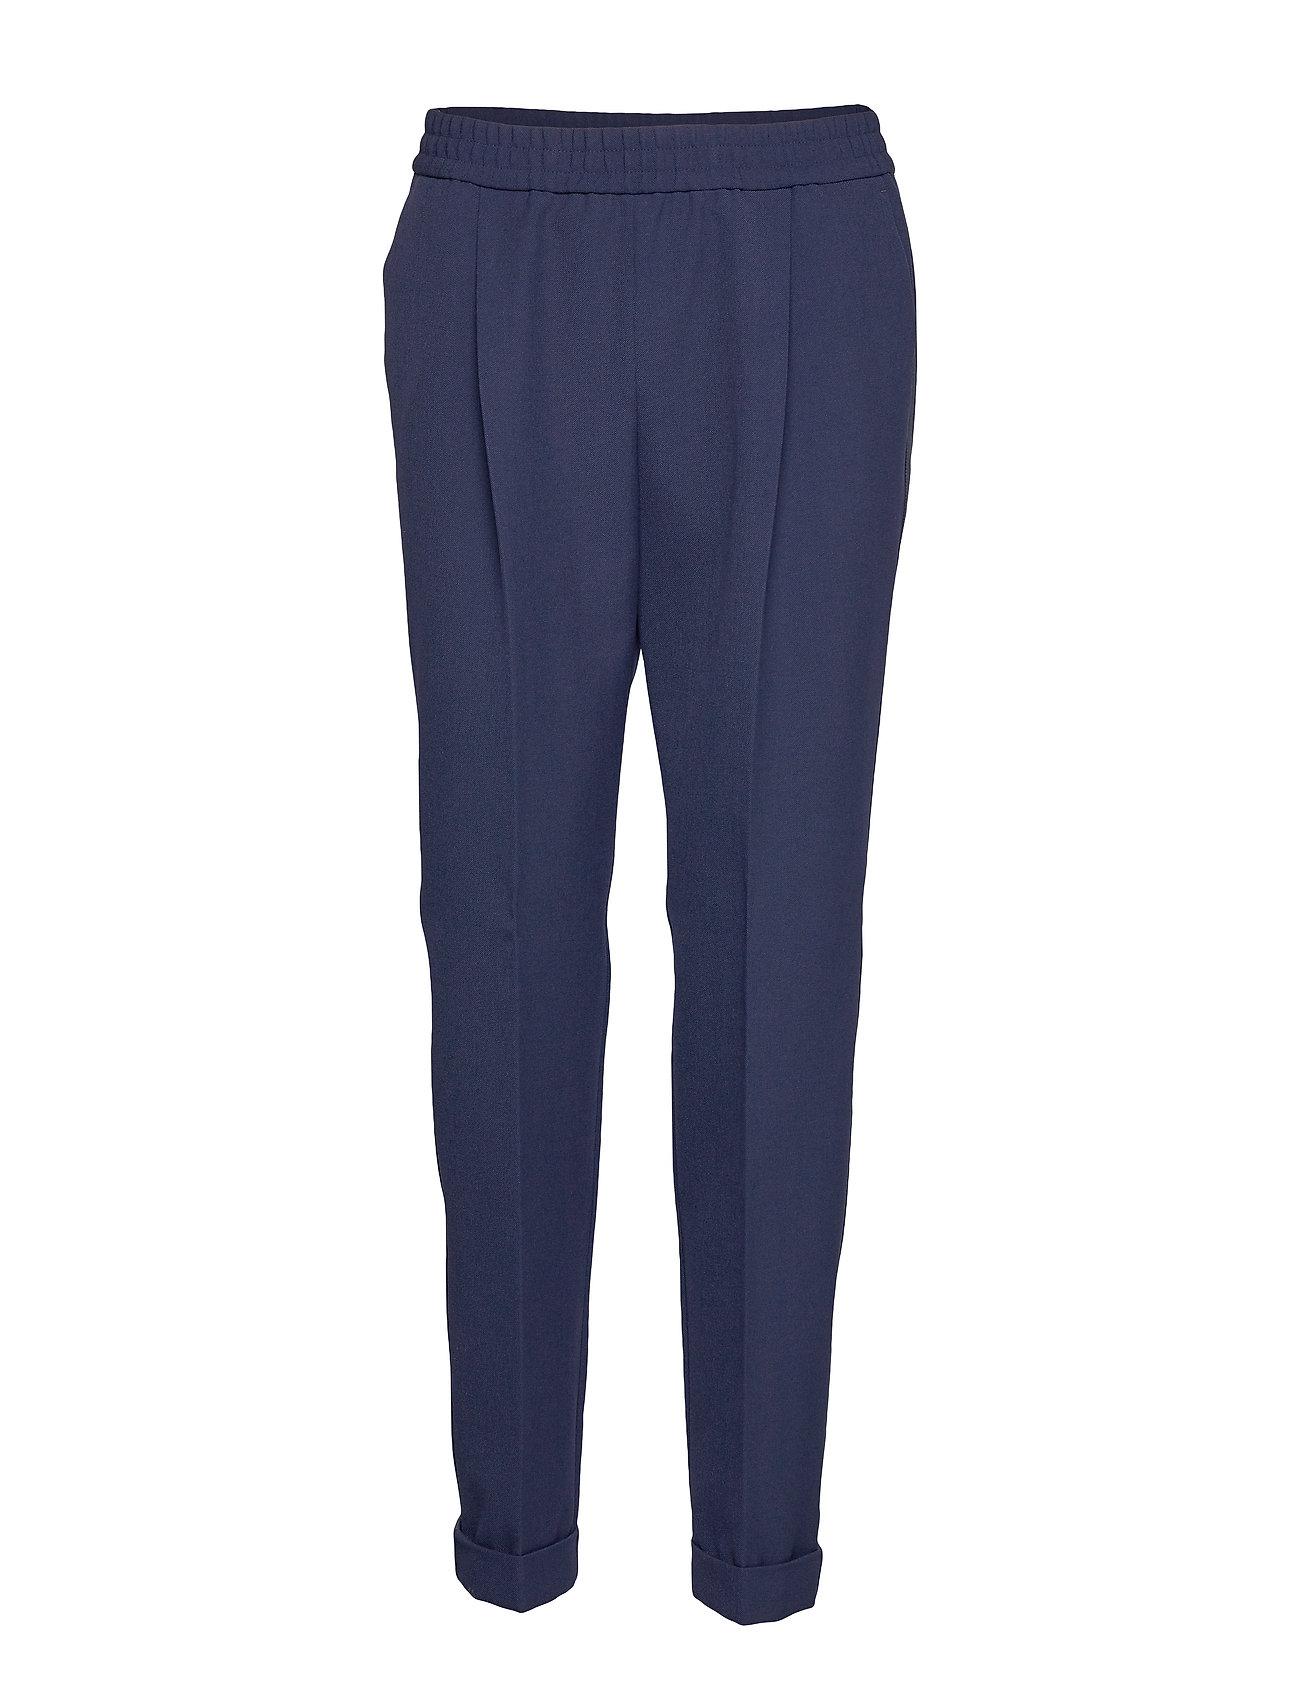 BOSS Business Wear Tariyesa1 - OPEN BLUE